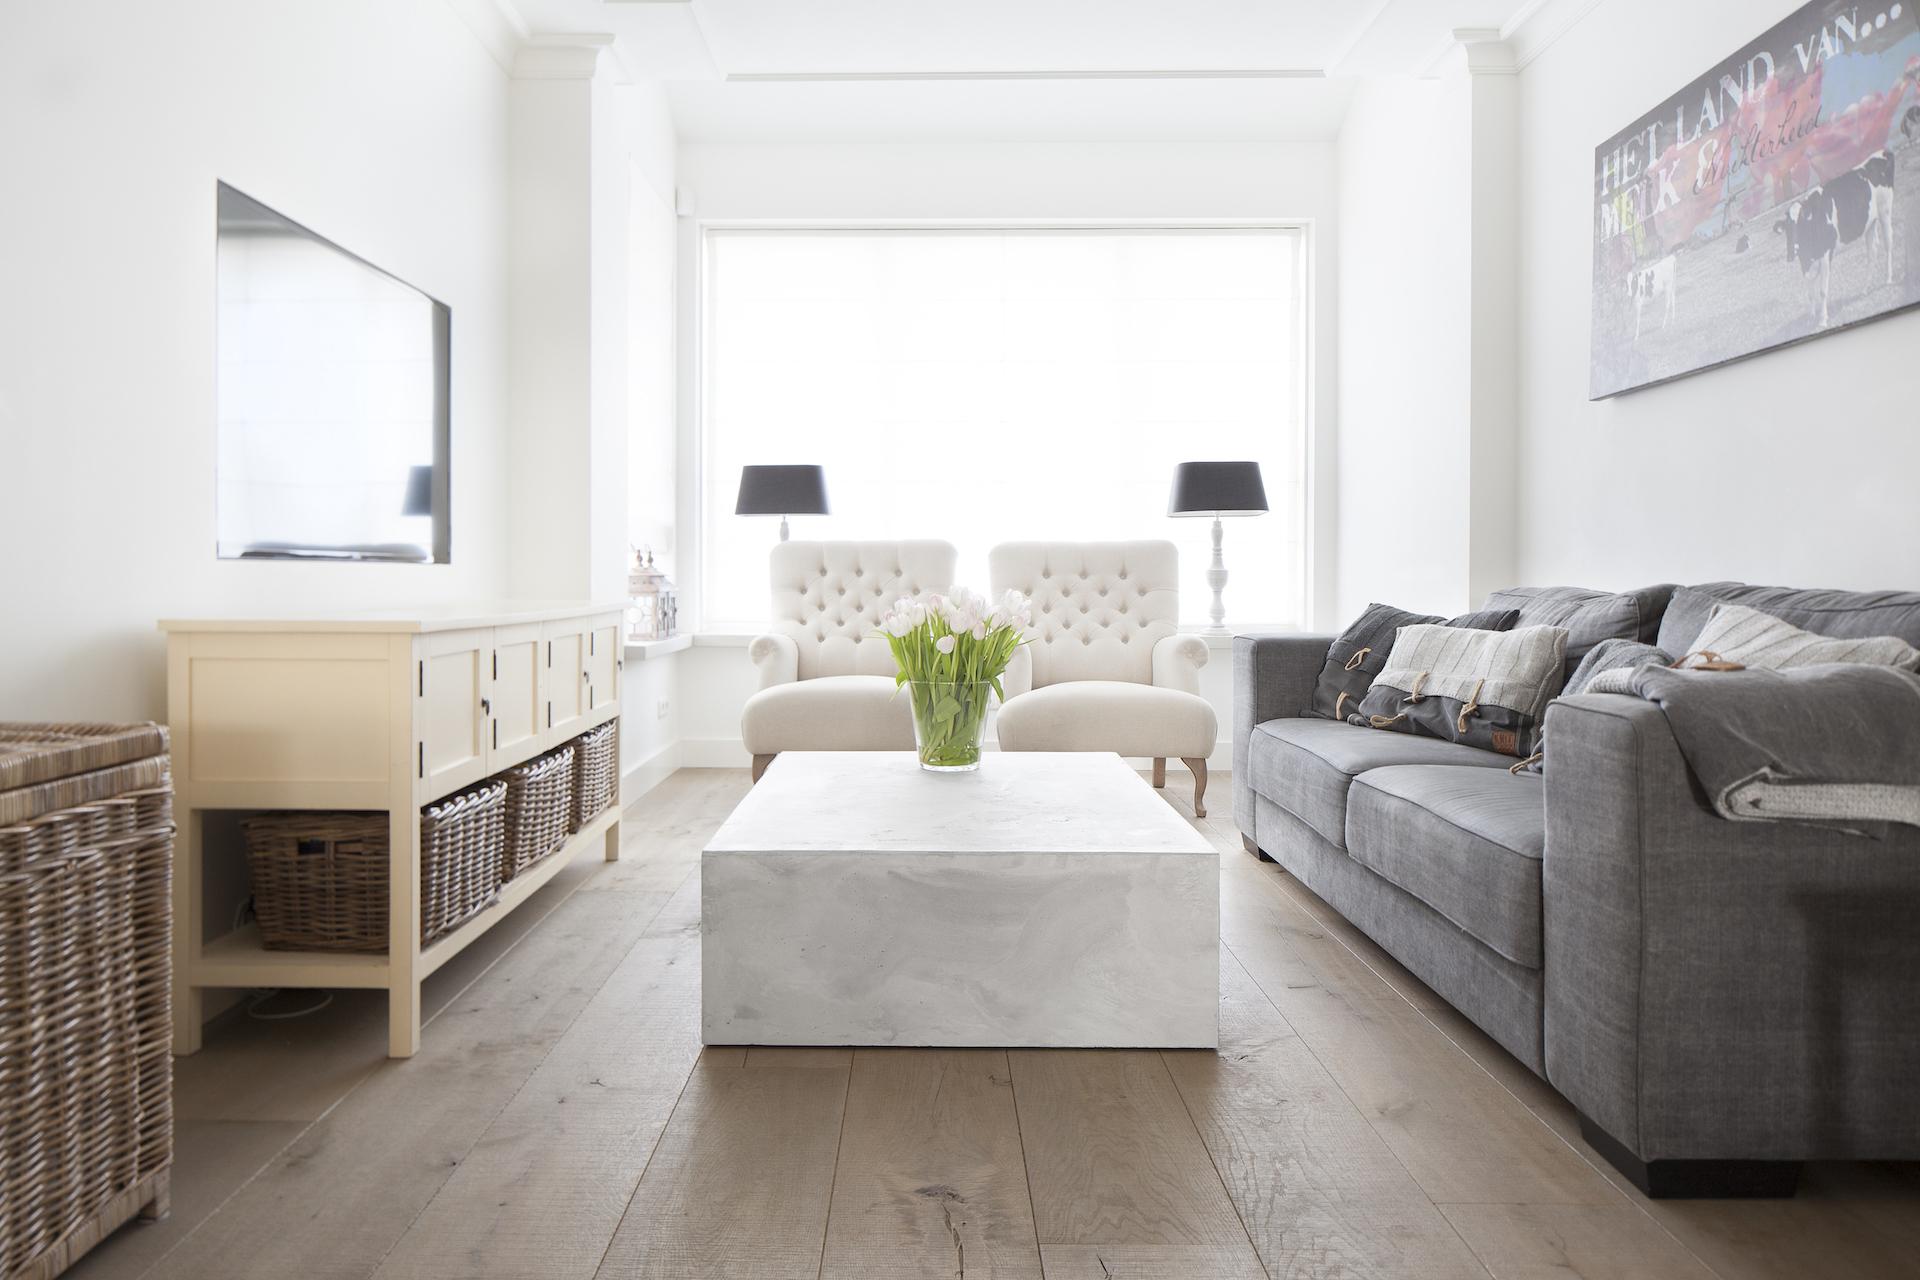 https://www.grezzo.nl/wp-content/uploads/2017/08/grezzo-salontafel-woonkamer-betonlook-1.jpg